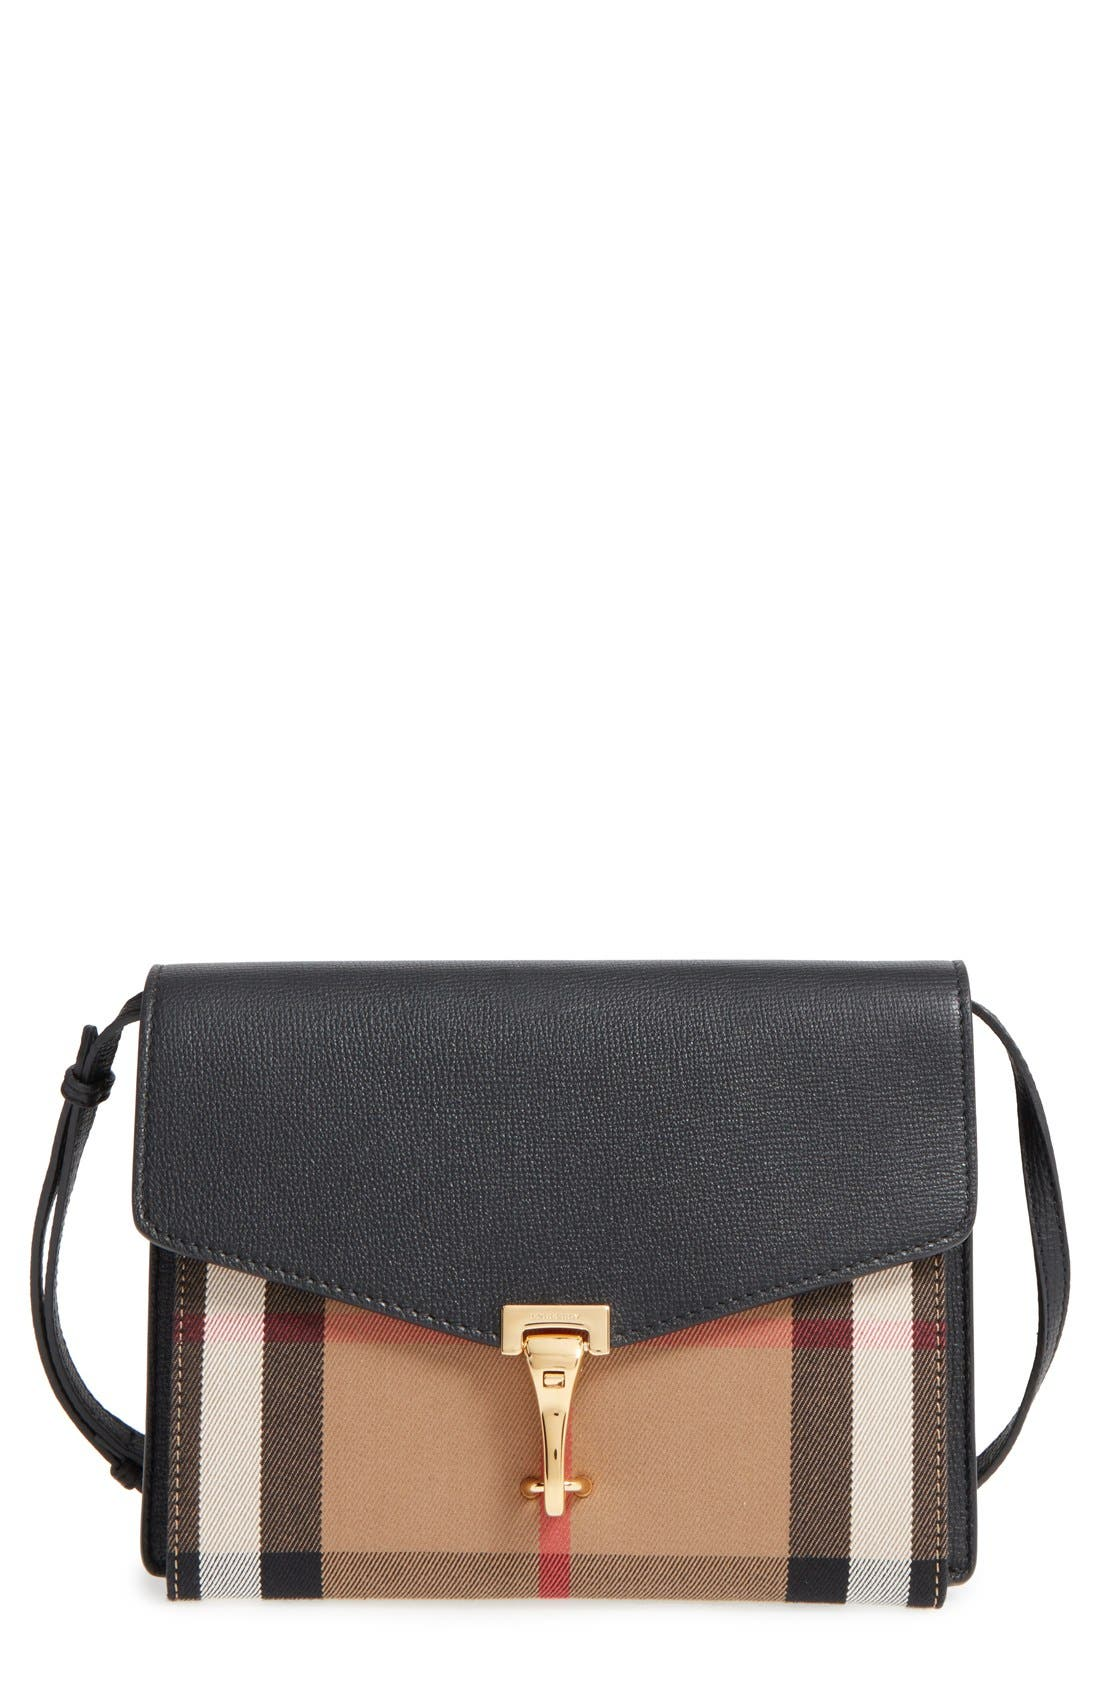 'Small Macken' House Check Crossbody Bag,                             Main thumbnail 1, color,                             BLACK